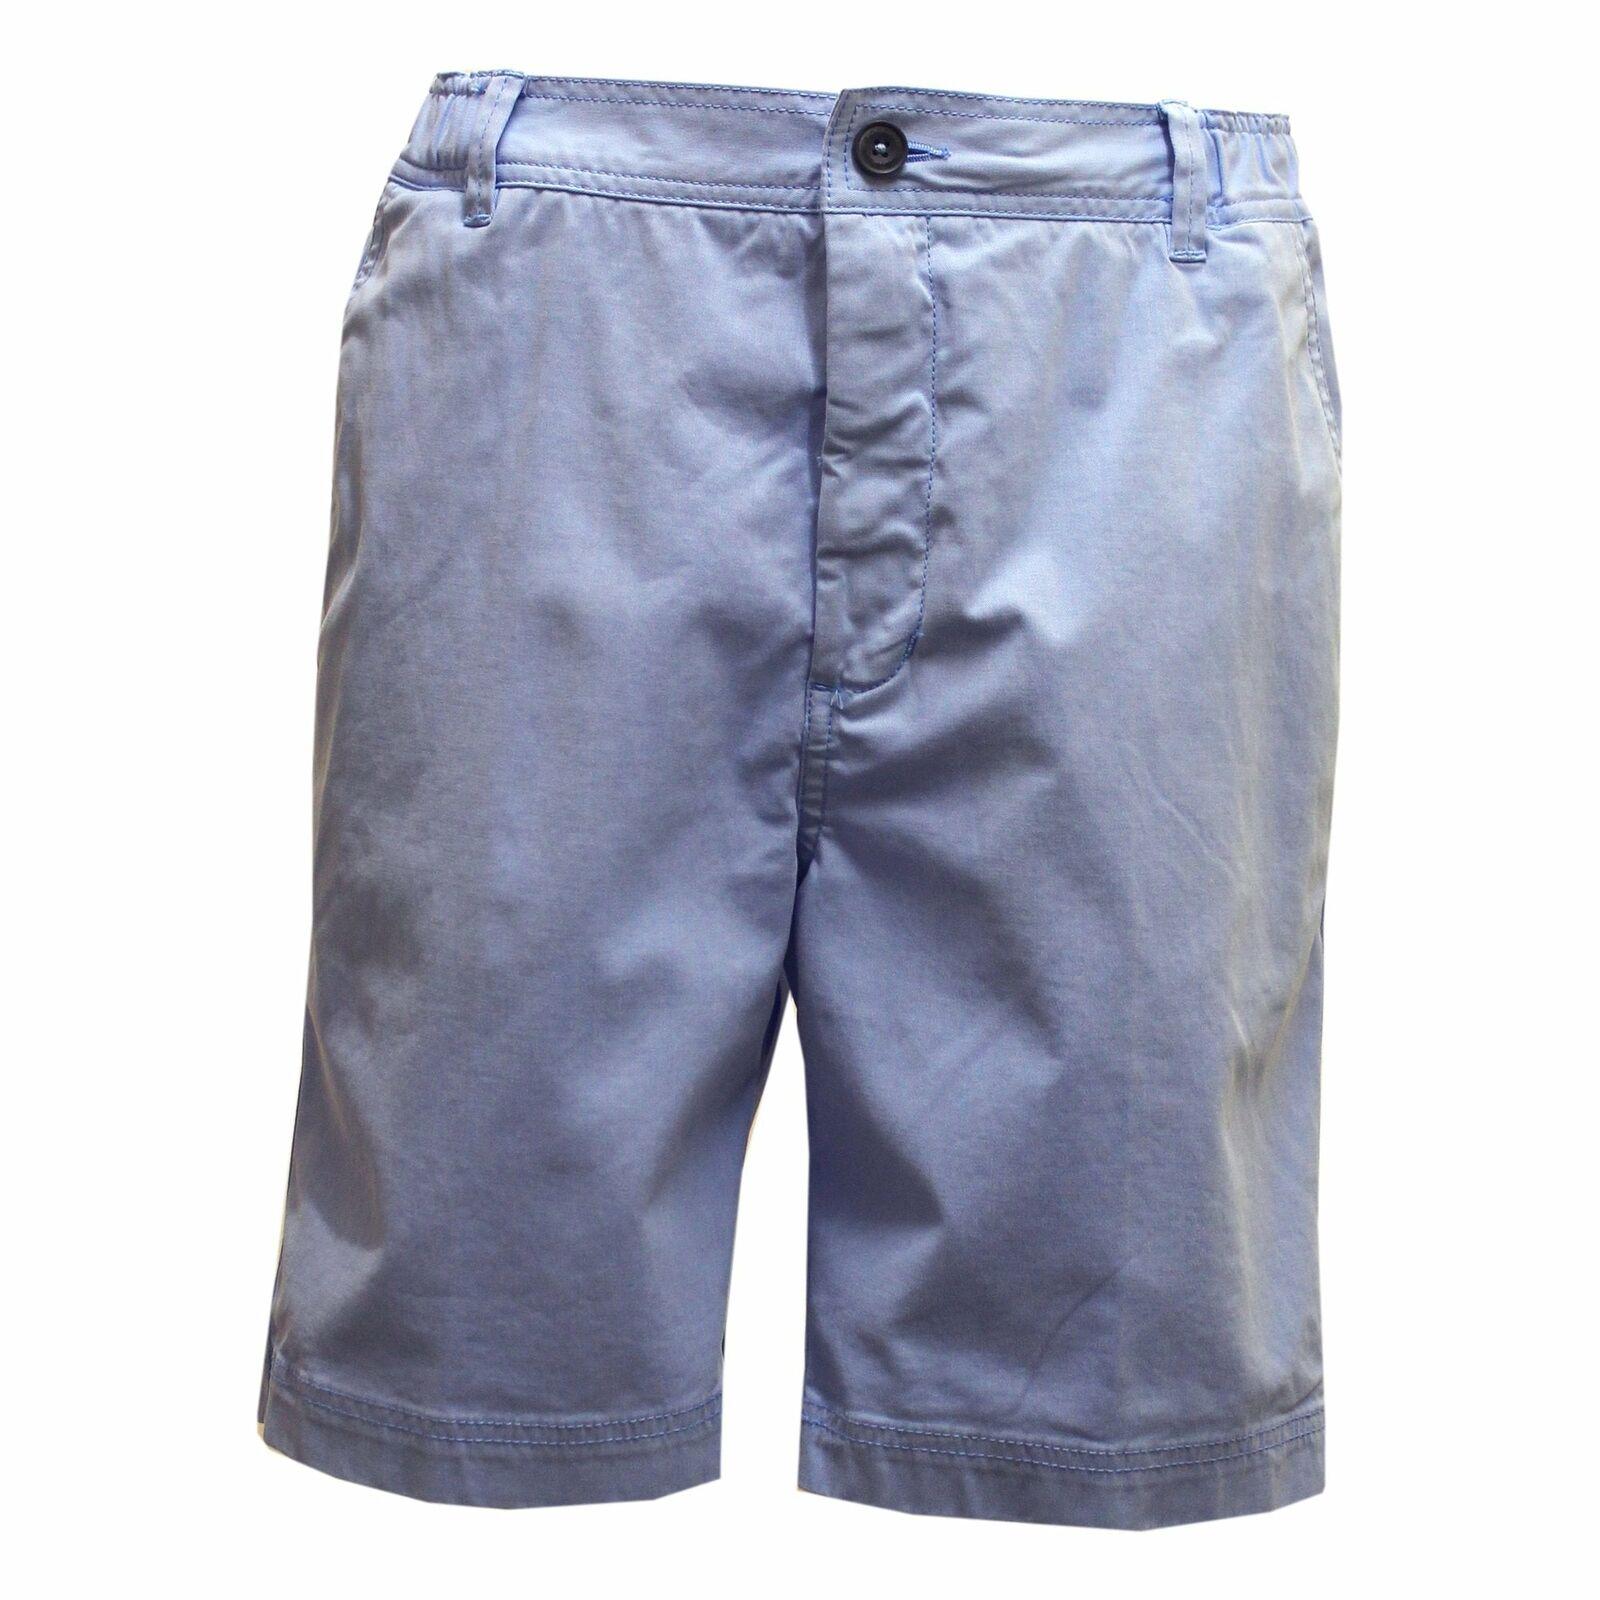 Giordano Pantaloncini 911117 Blu o pietra